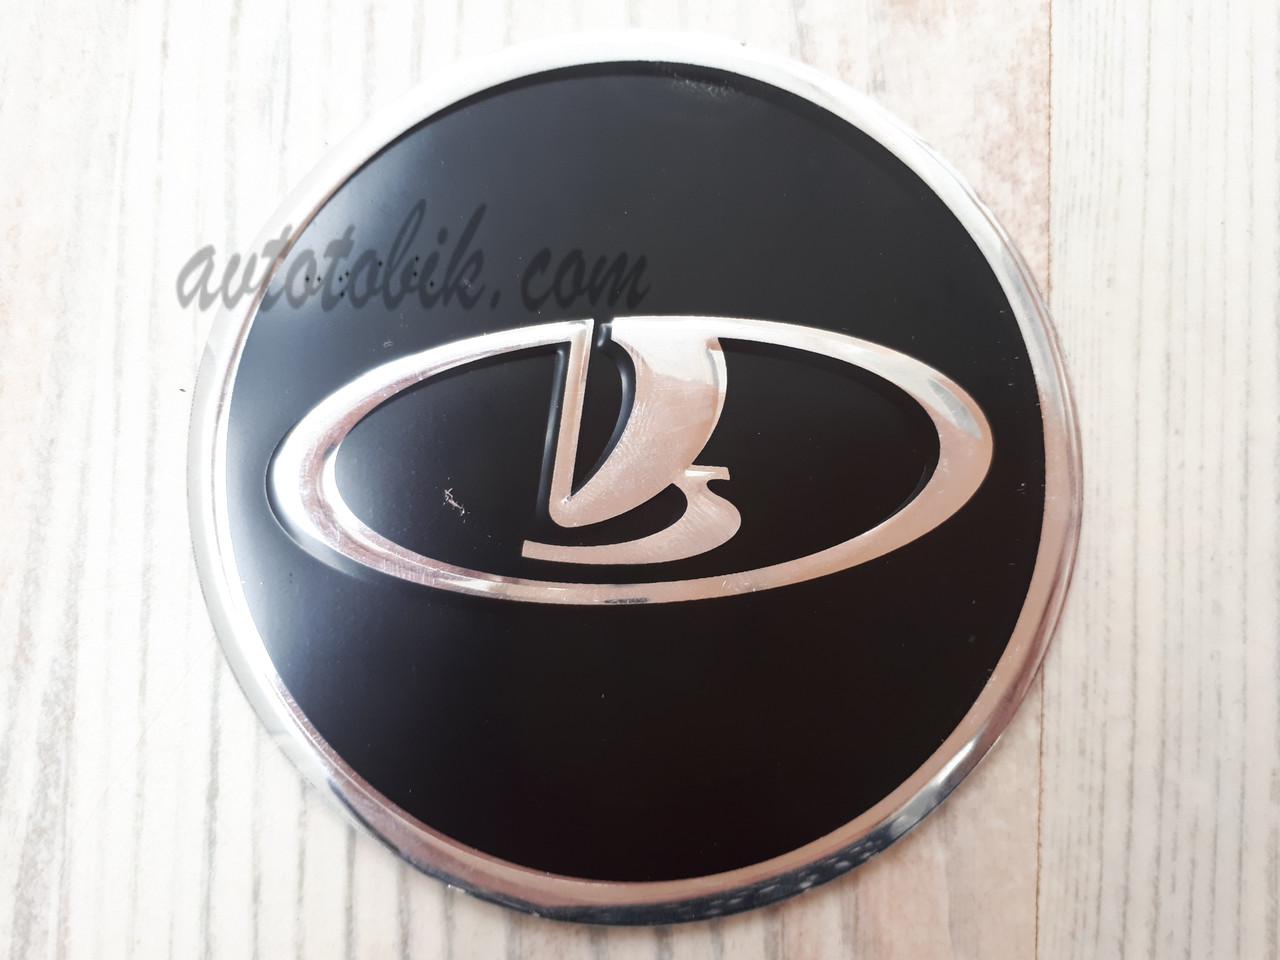 Наклейка эмблема на колпаки Lada 90 мм (4 шт.)